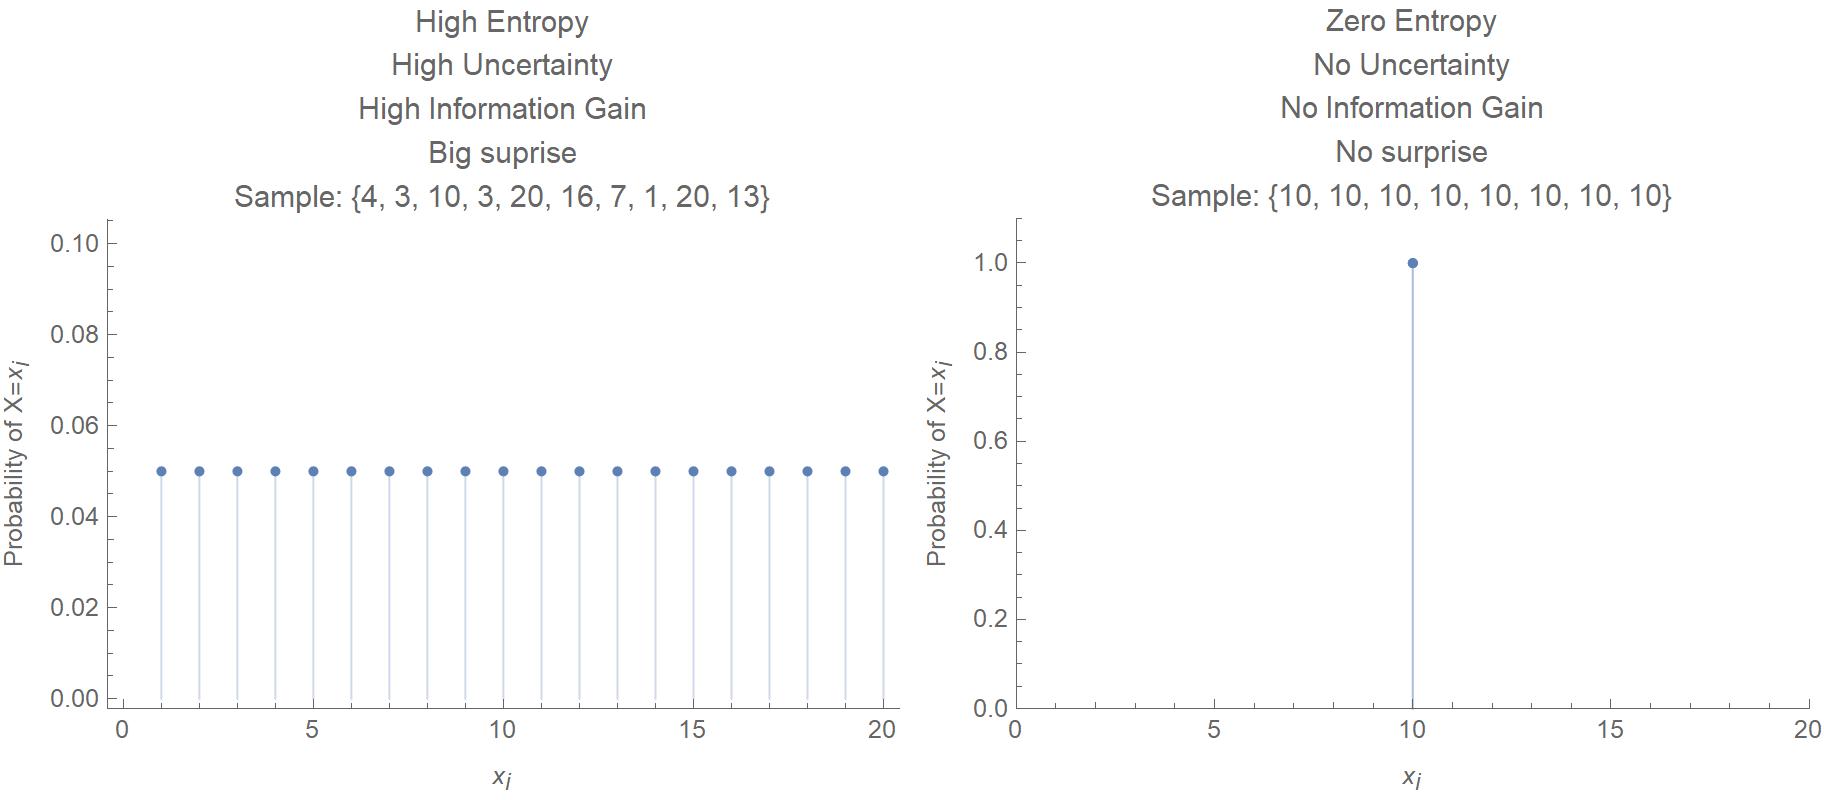 Low vs. hight entropy